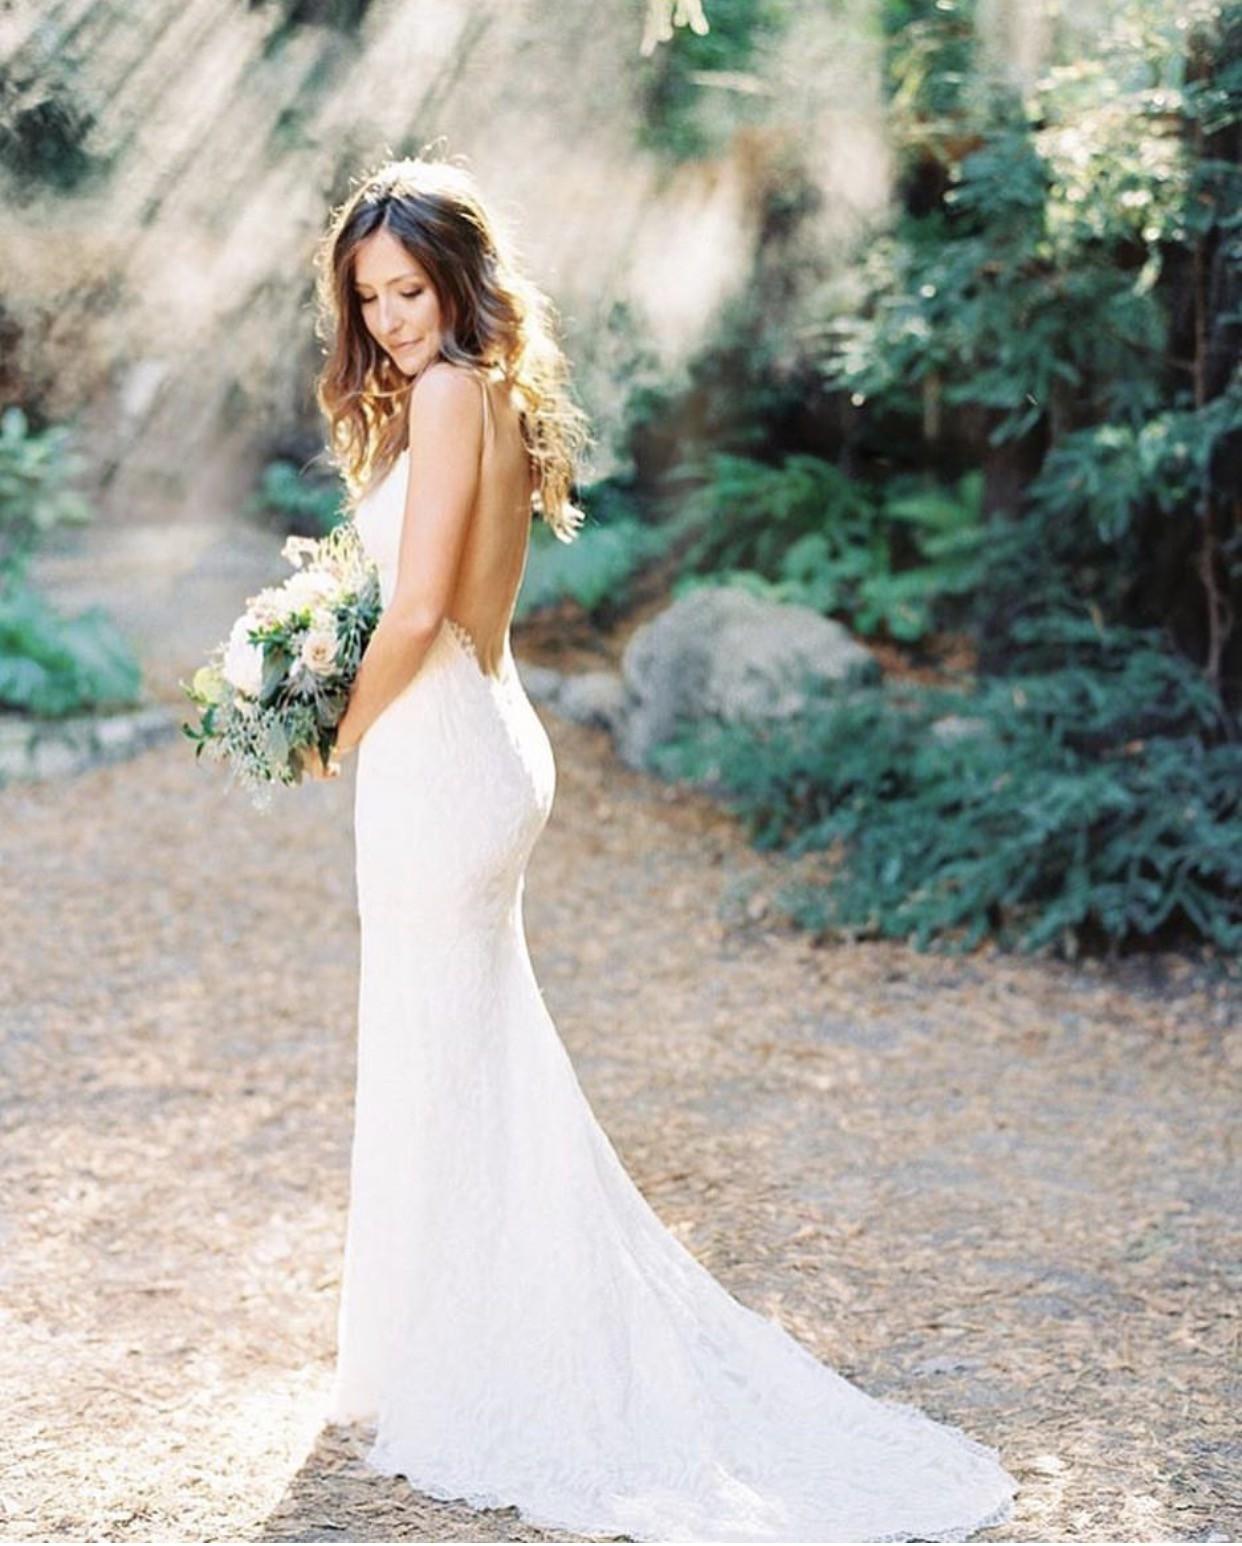 Katie May Wedding Dress: Katie May Lanai Gown Preloved Wedding Dress On Sale 43